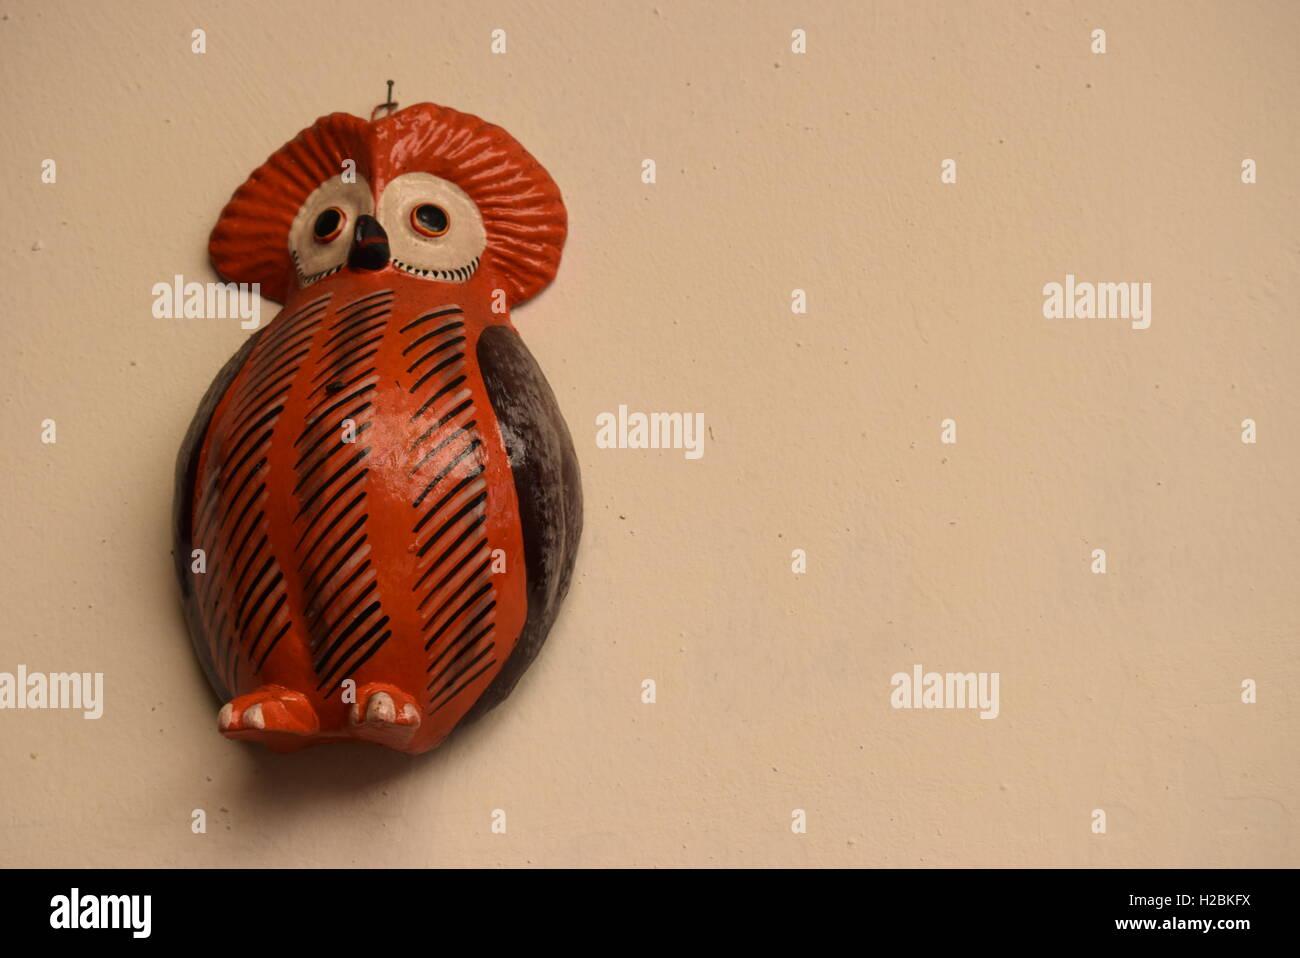 Owl Decoration Stock Photos & Owl Decoration Stock Images - Alamy